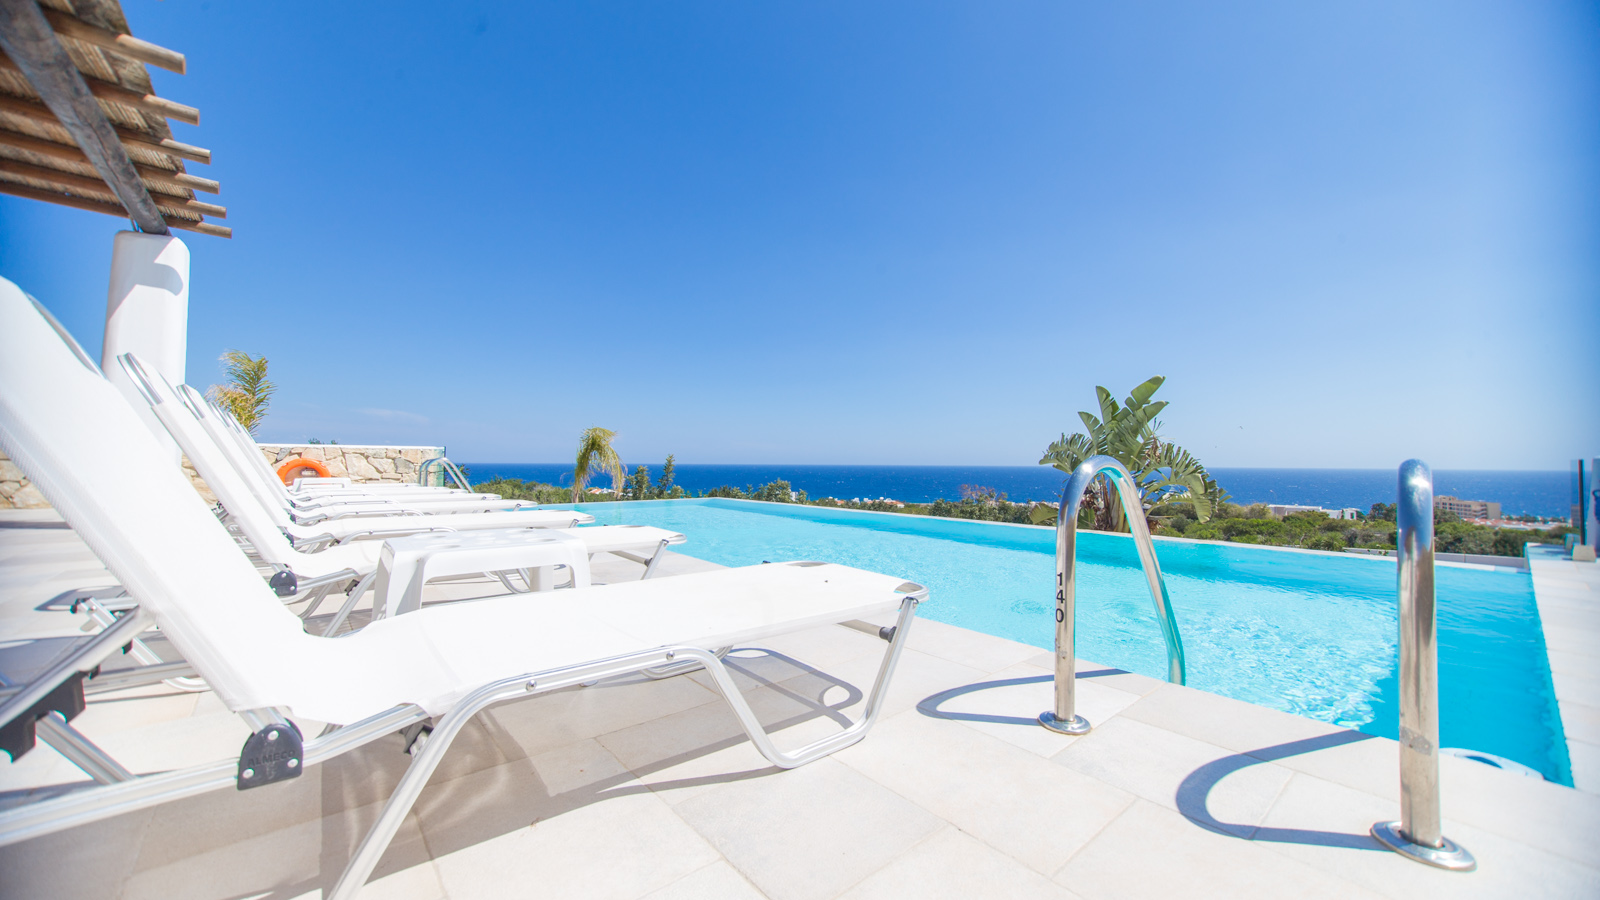 5 Bed Short Term Rental Villa Protaras